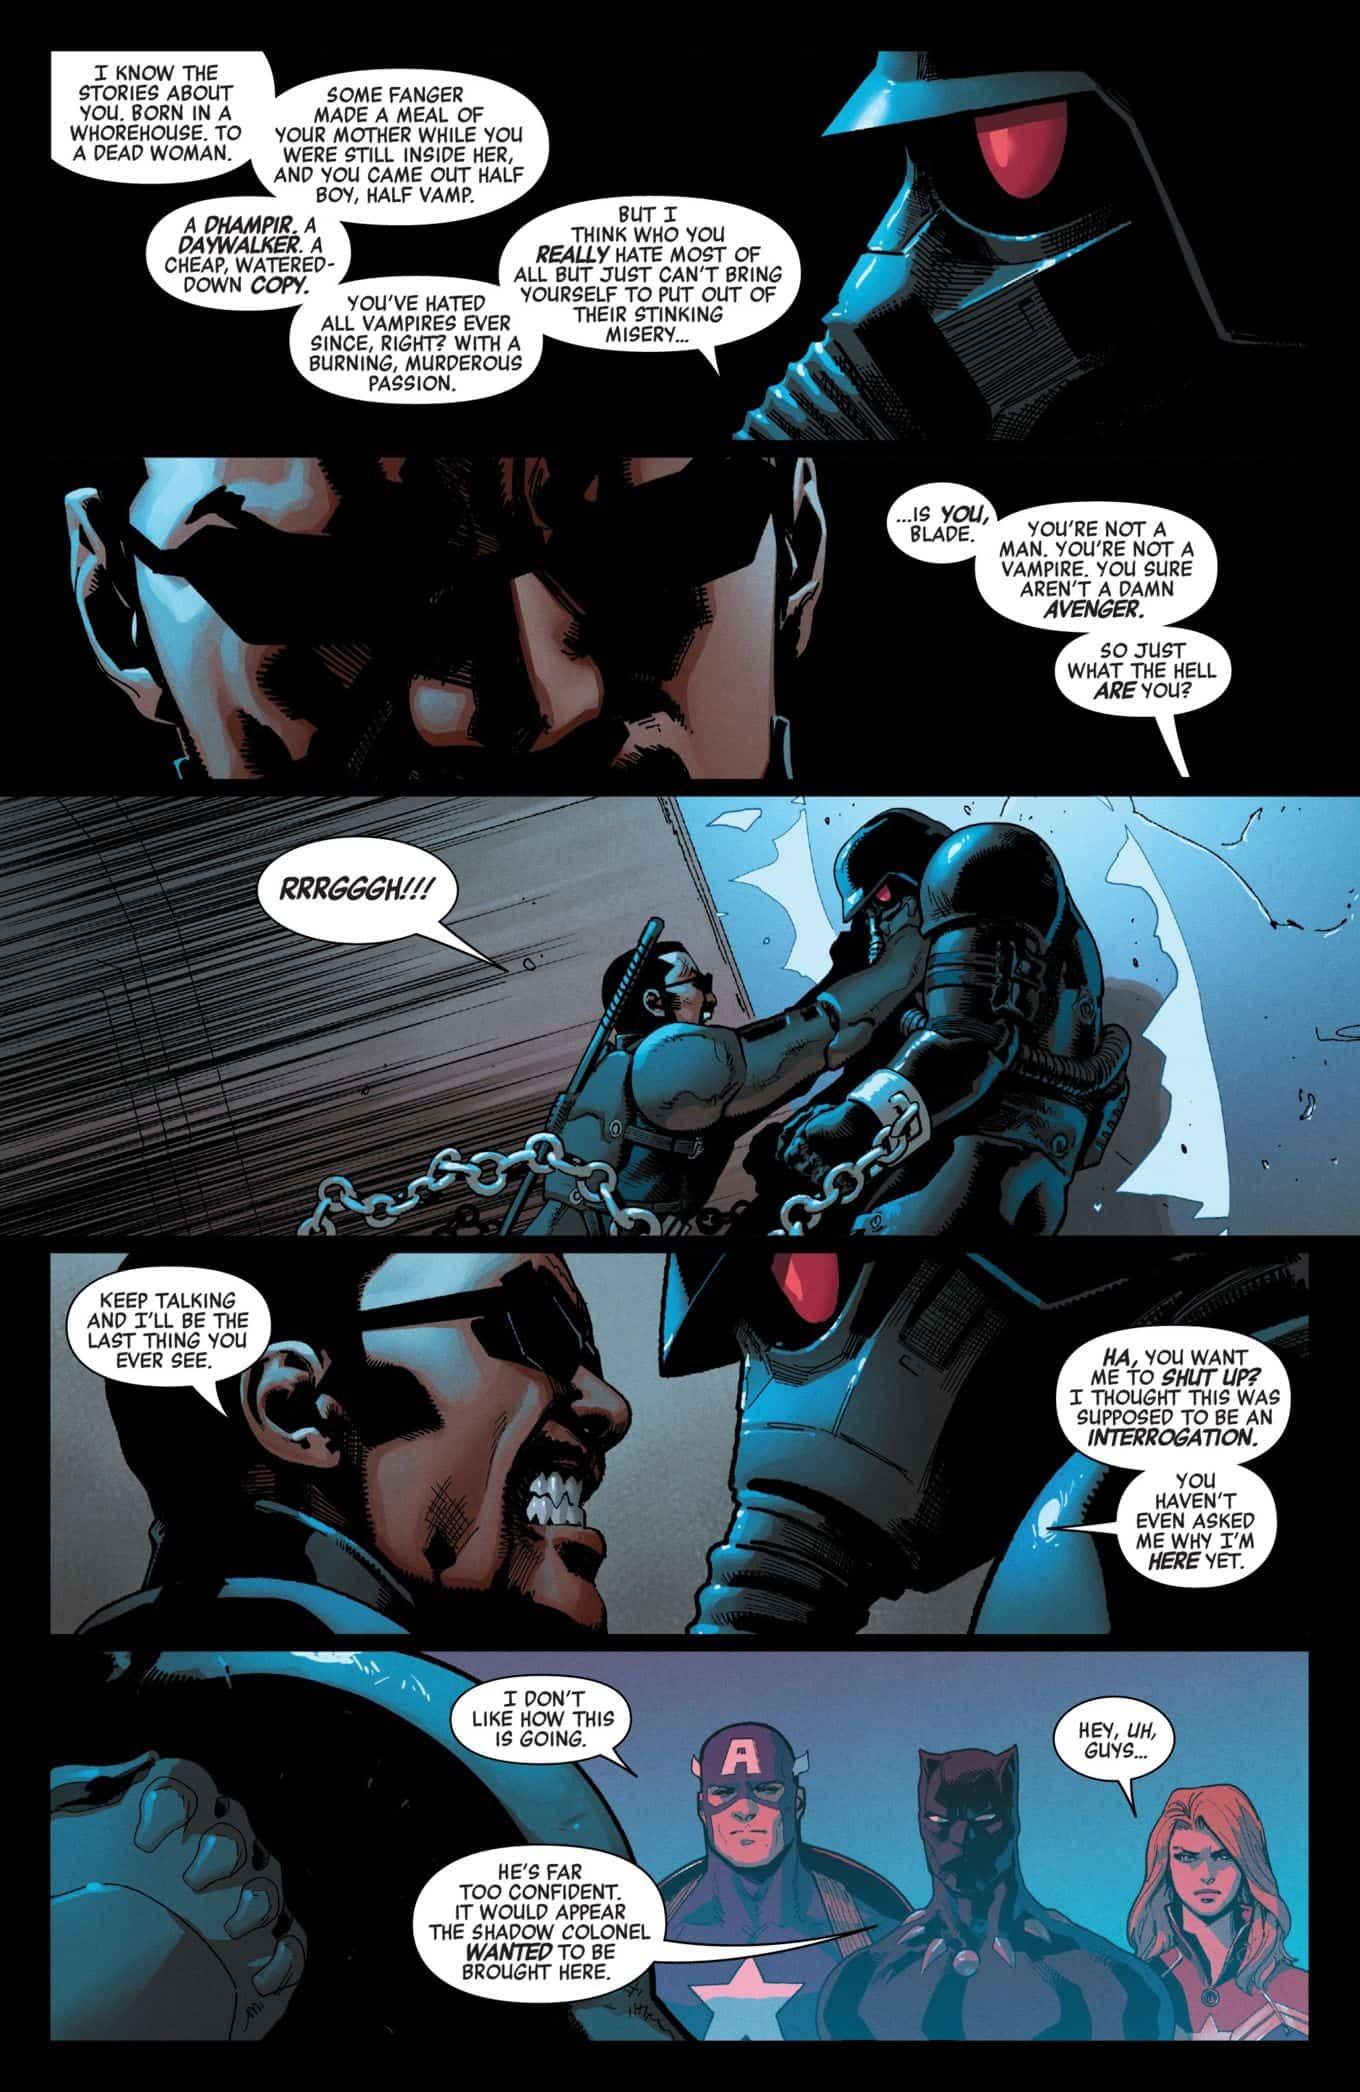 The Avengers: Marvel Comics Universe & Avengers #14 Spoilers: Civil War